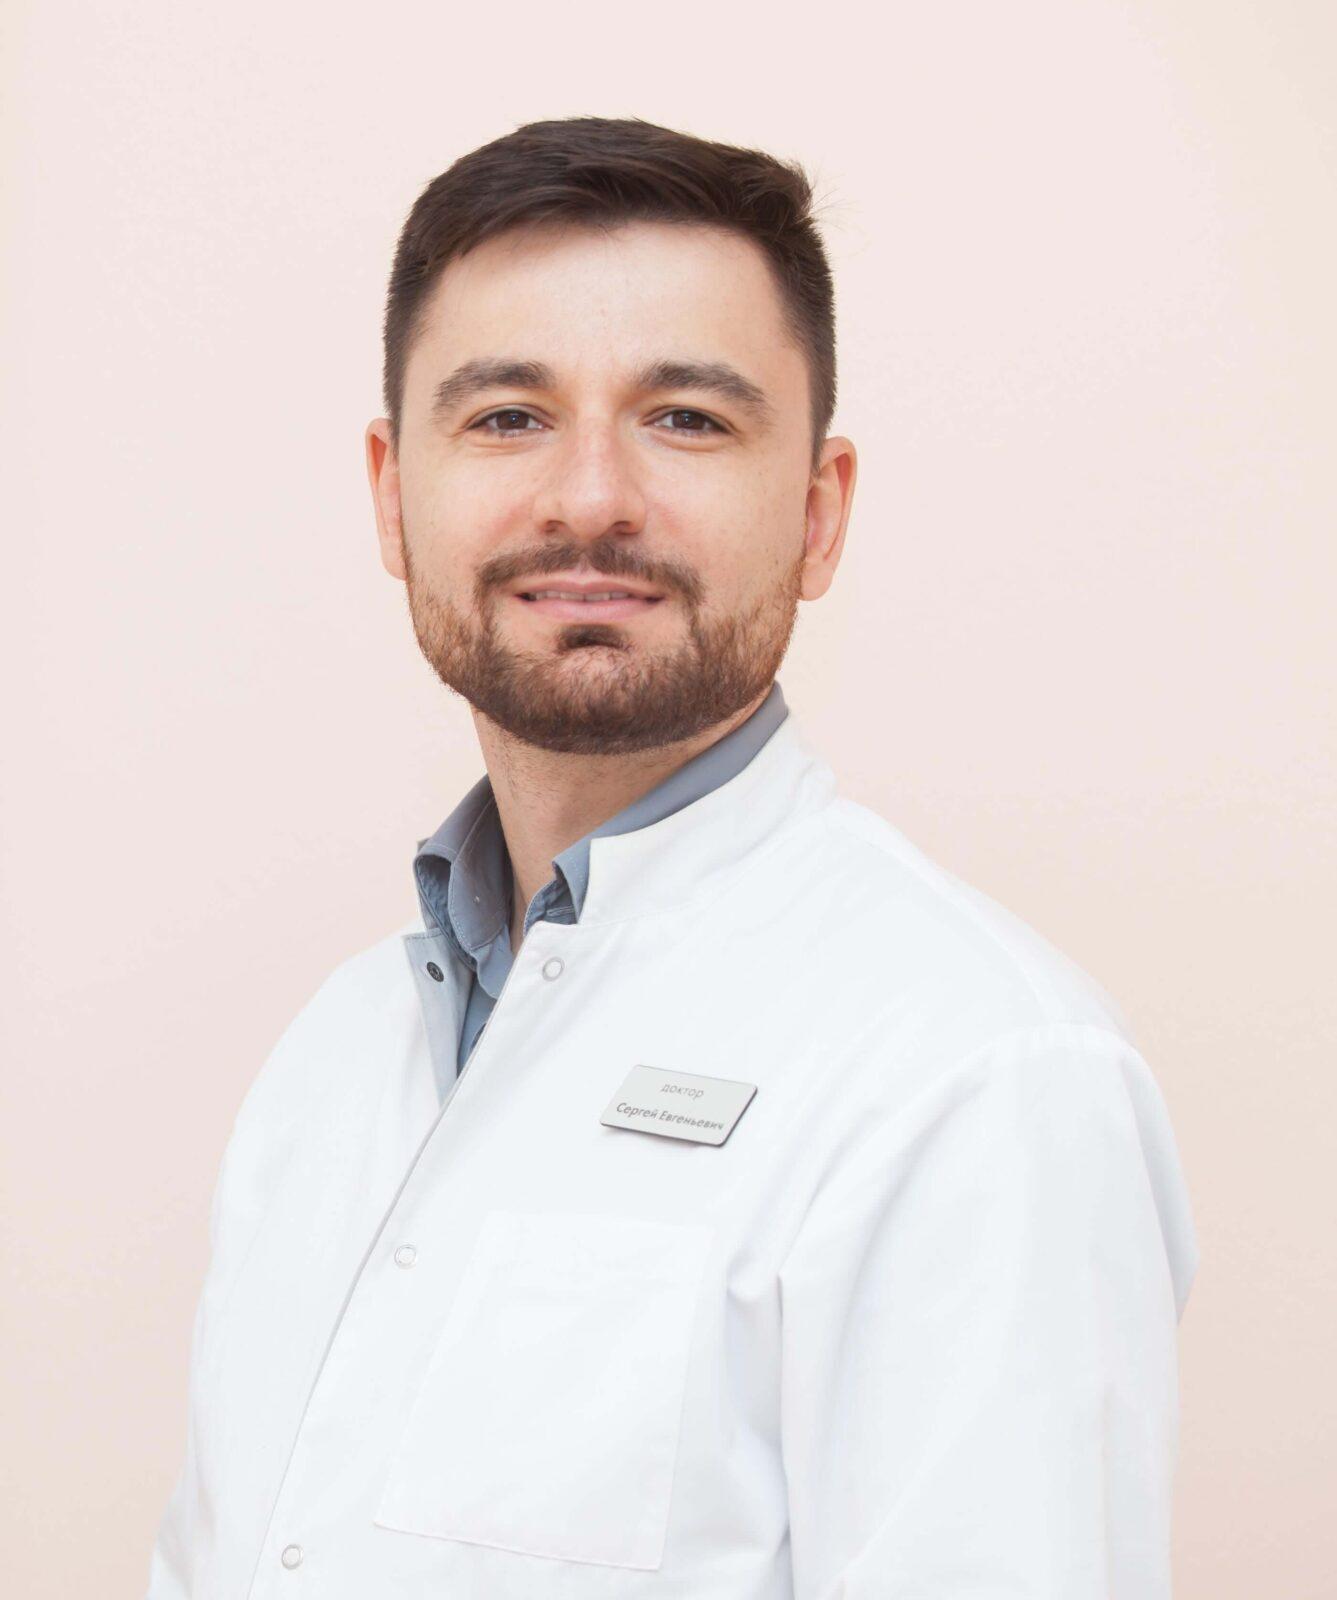 goldlaser.com.ua Размещение контента на сайте 13.09.2017 12-17-00 20195